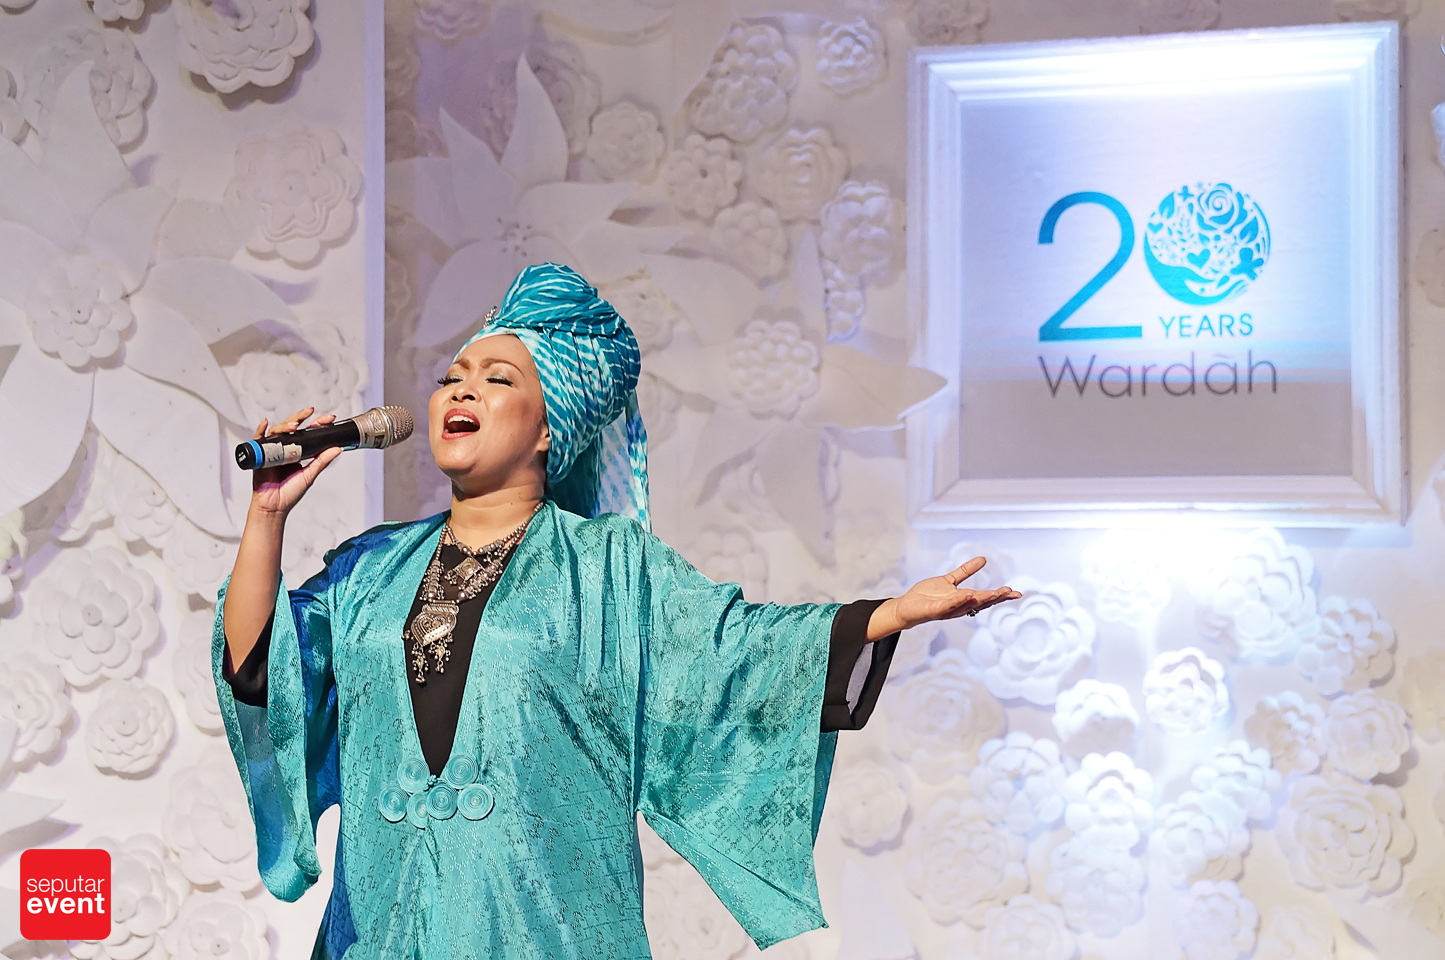 The 20th Anniversary of Wardah (60).JPG